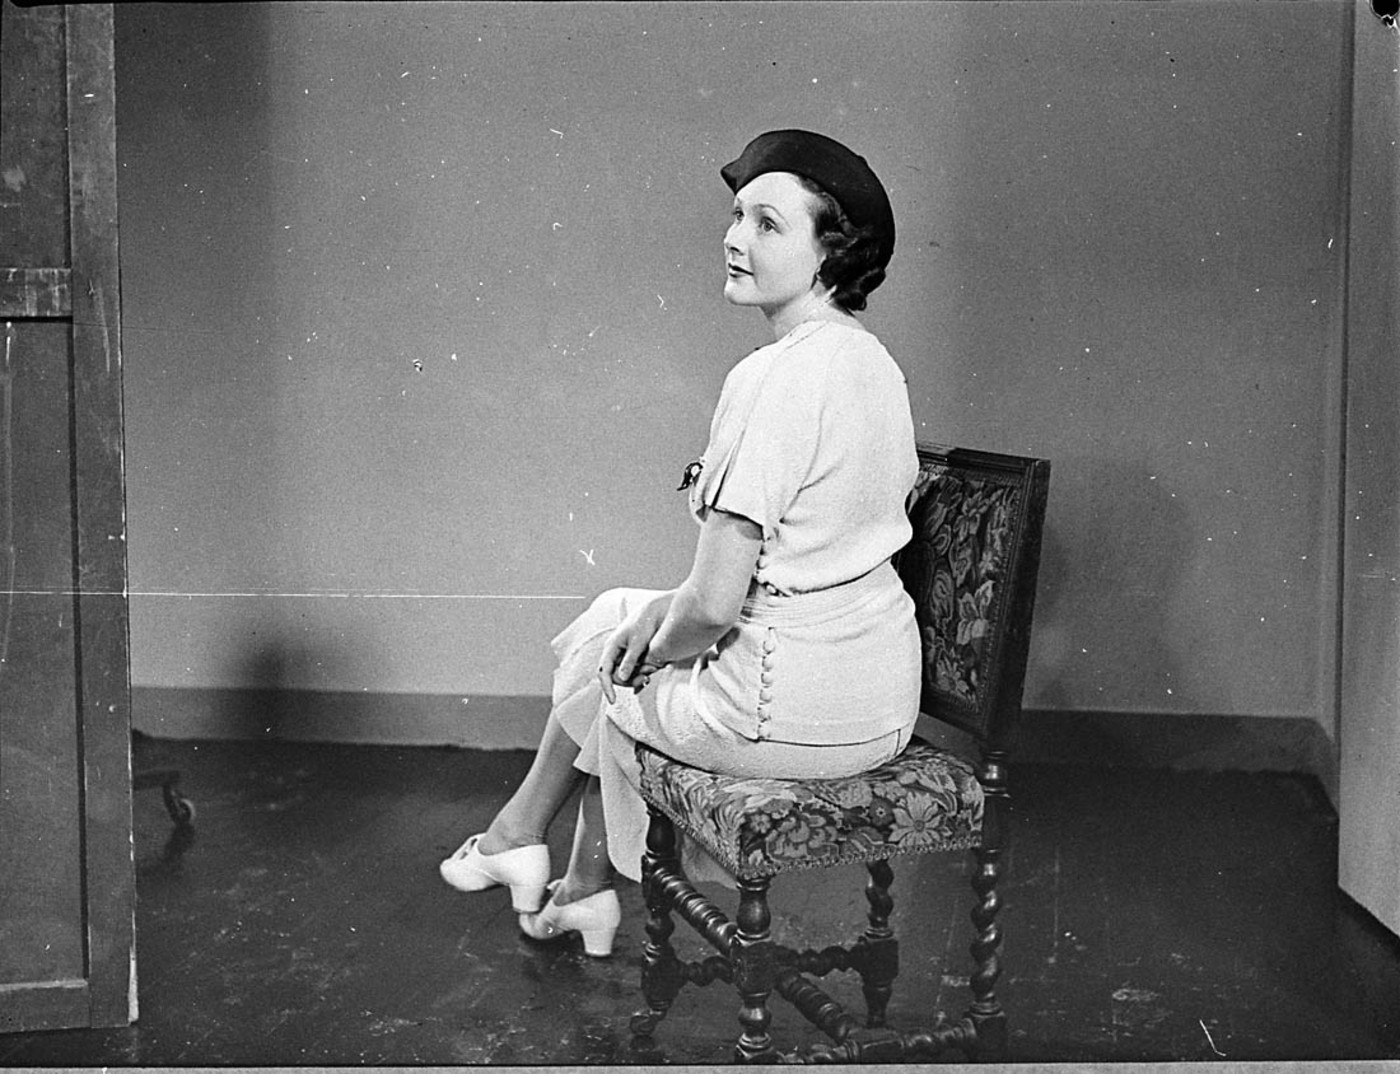 What is a freelance model? Australian fashion model, 1930's, public domain